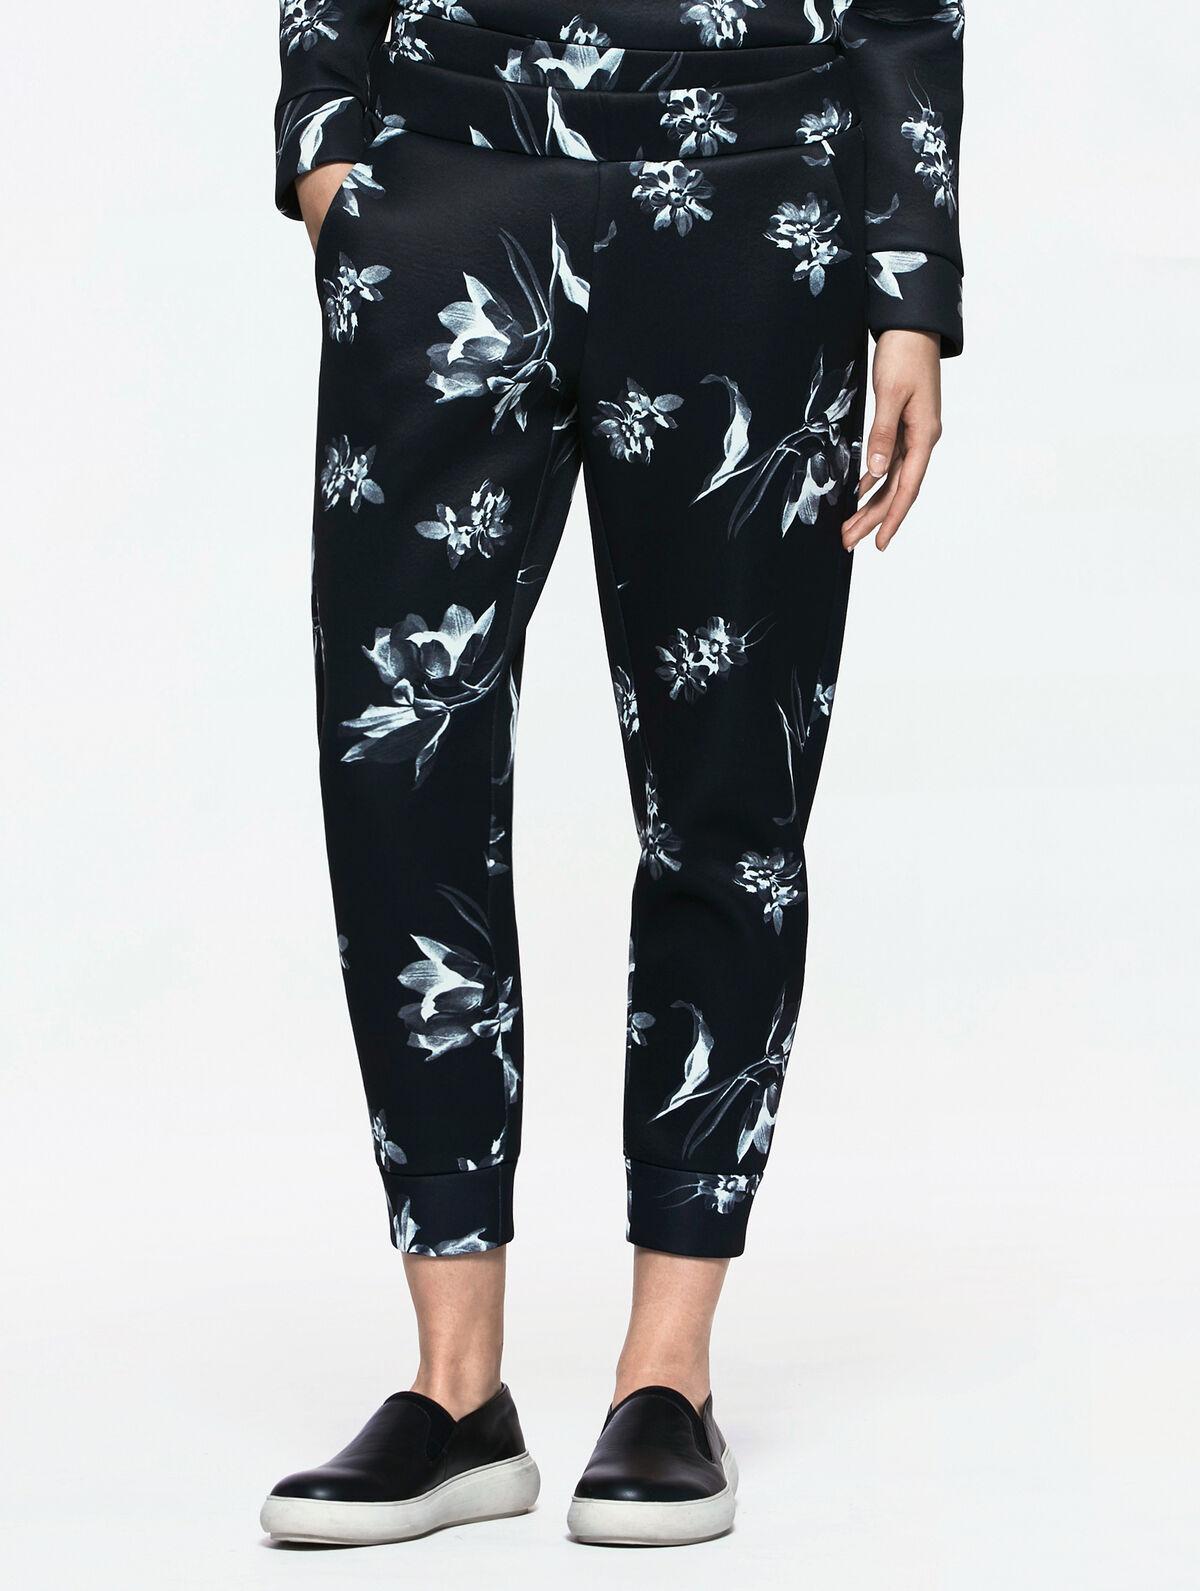 Perfect Stylish 2015 Women Joggers Floral Print Jogger Pants View Custom